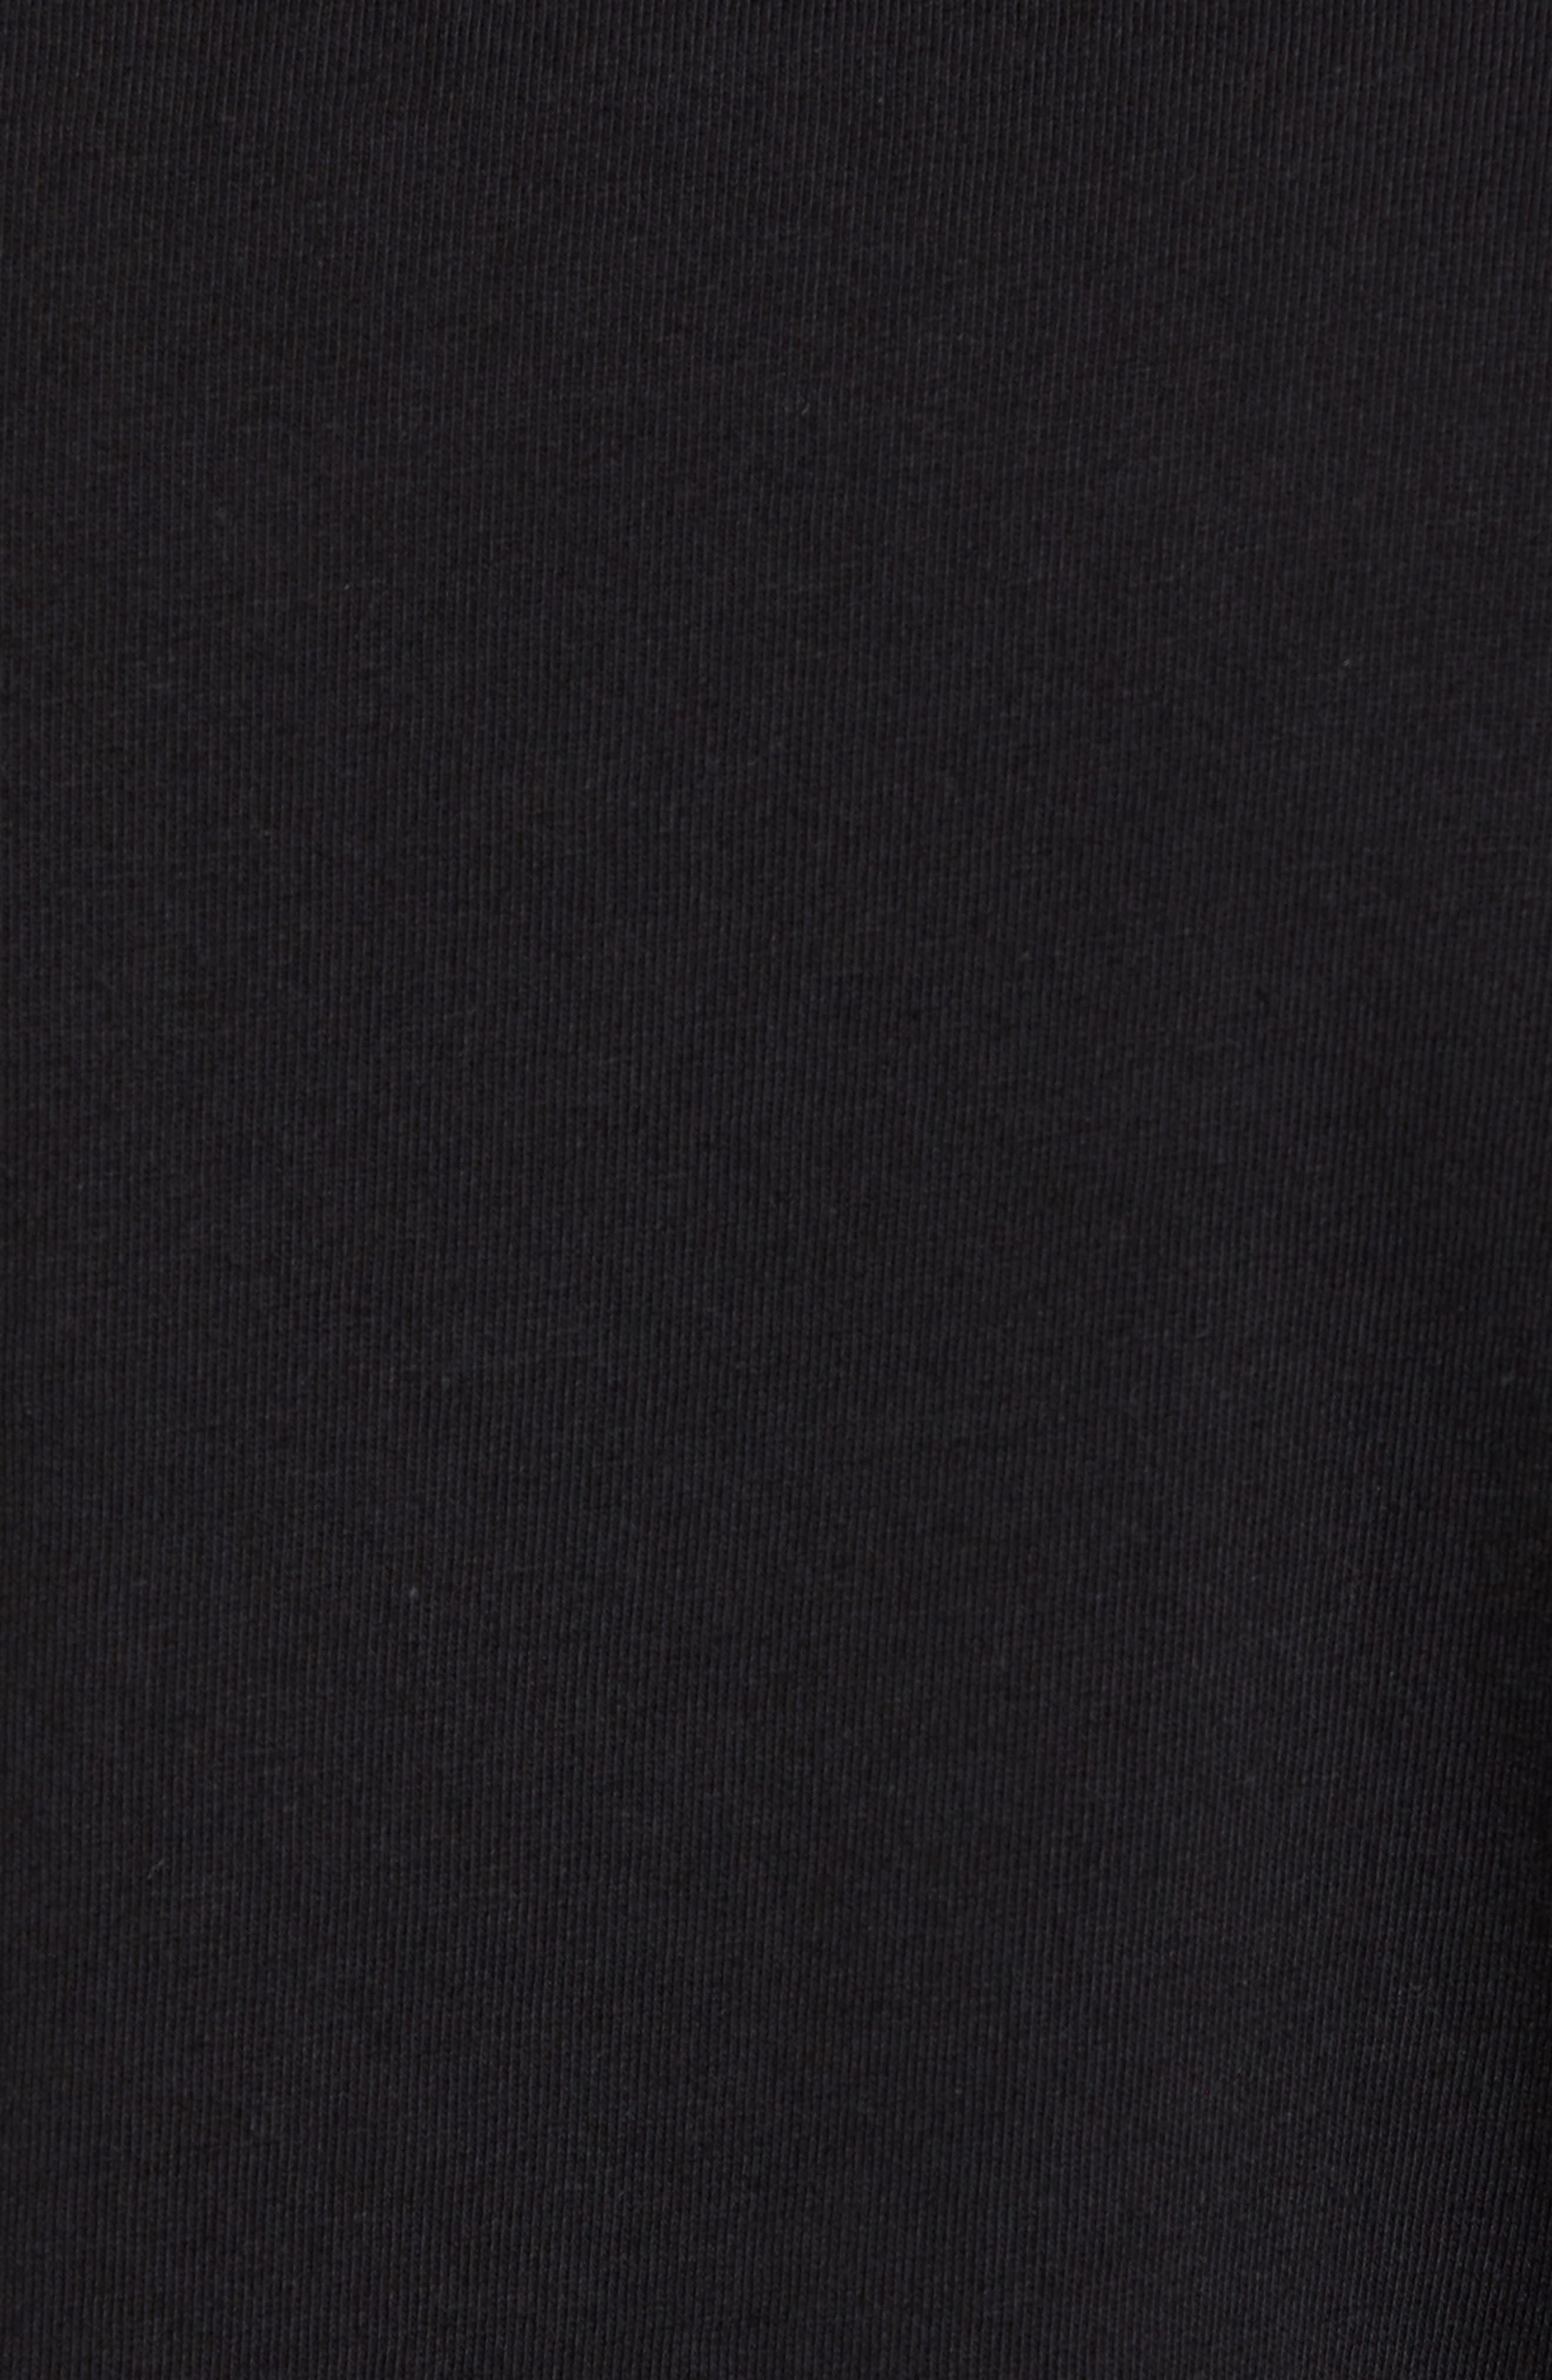 Hyper T-Shirt,                             Alternate thumbnail 5, color,                             Black